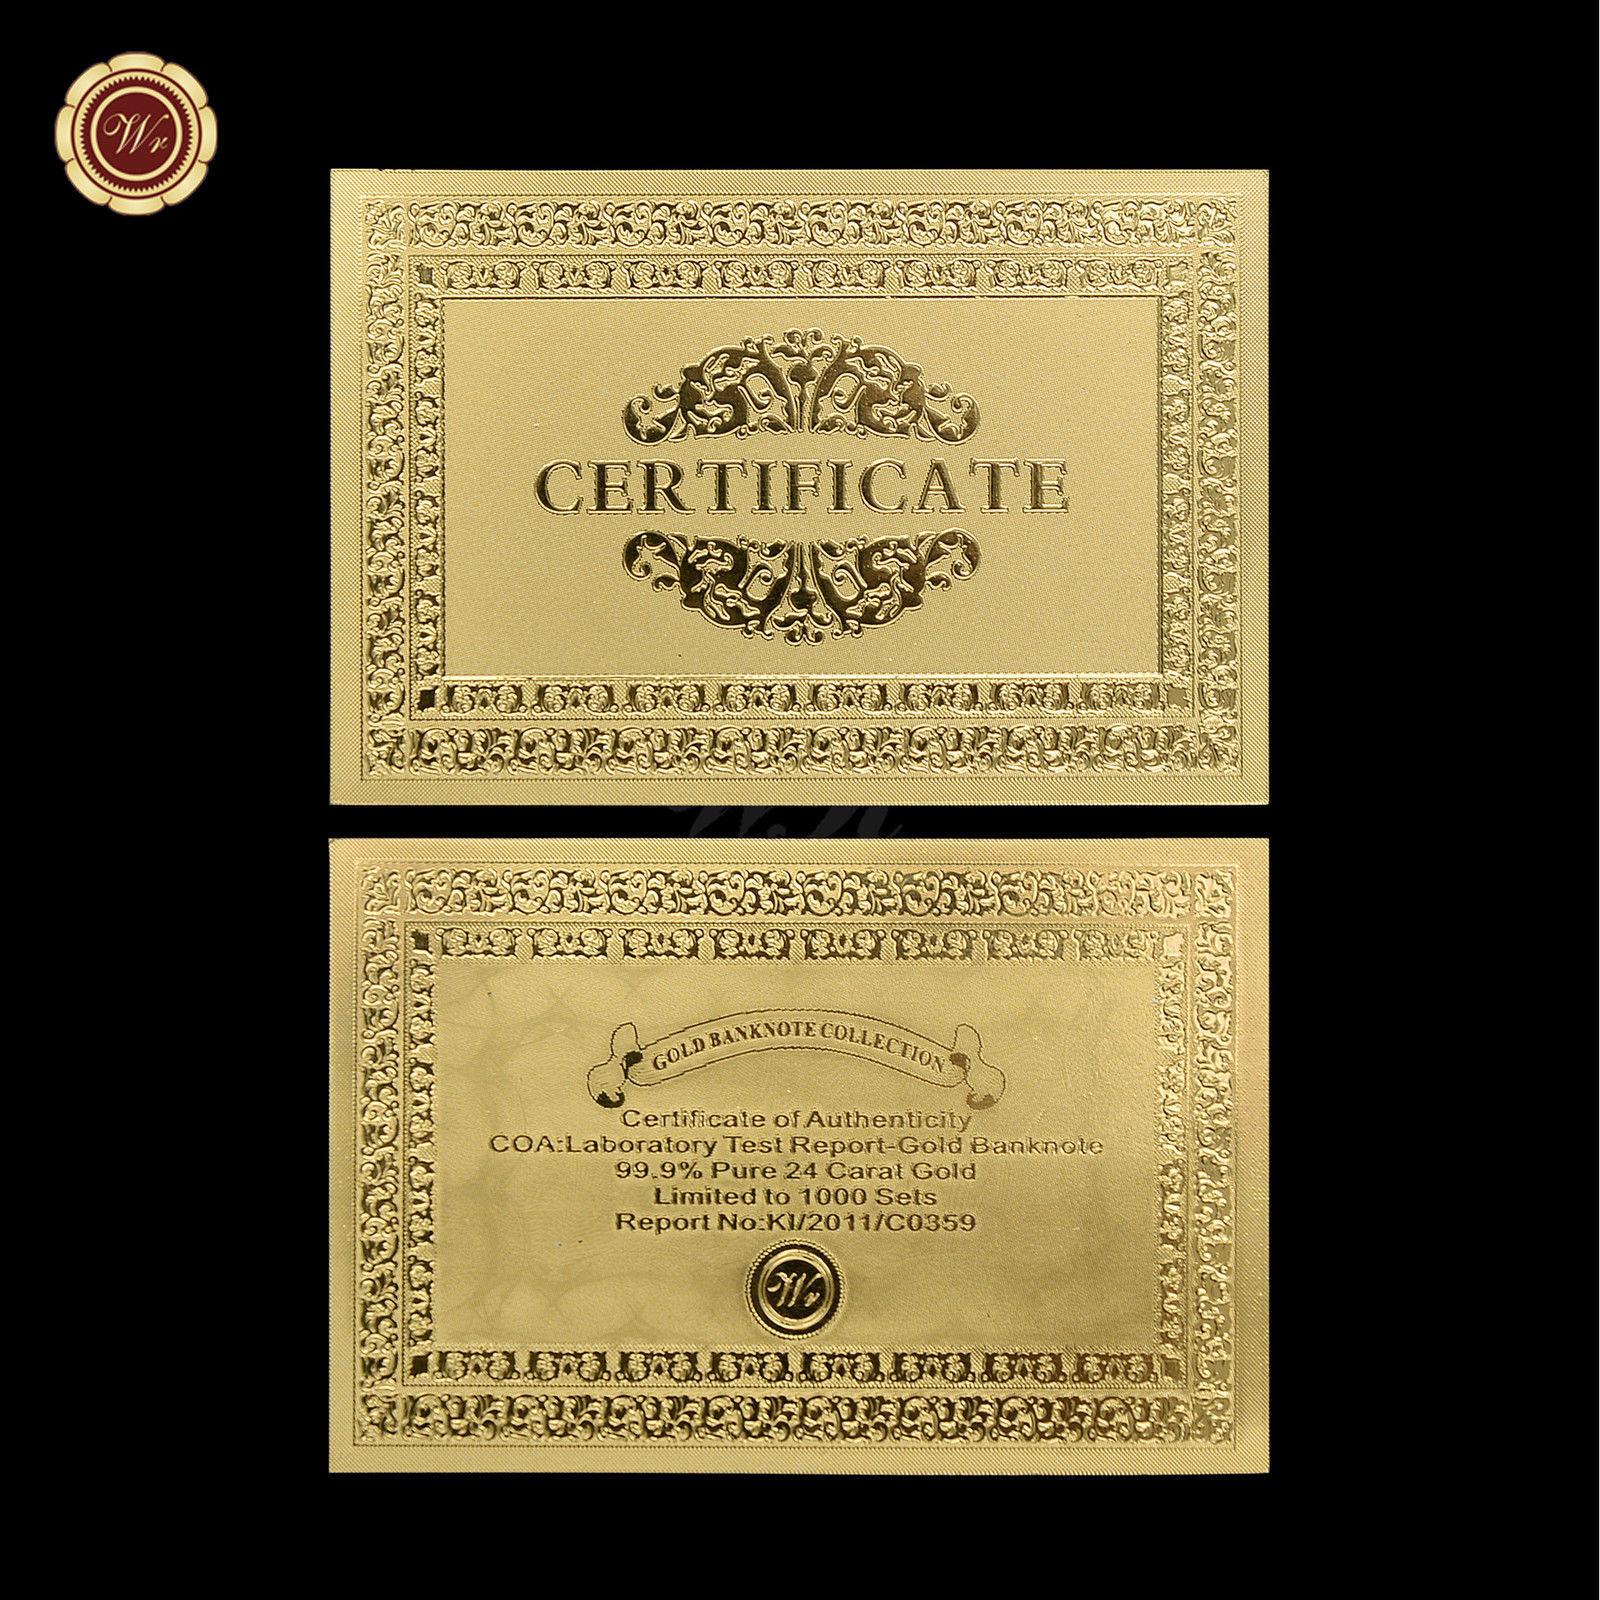 10pcs Zimbabwe 100 Trillion Dollars Banknotes Colorful 24k Gold Note Collectible